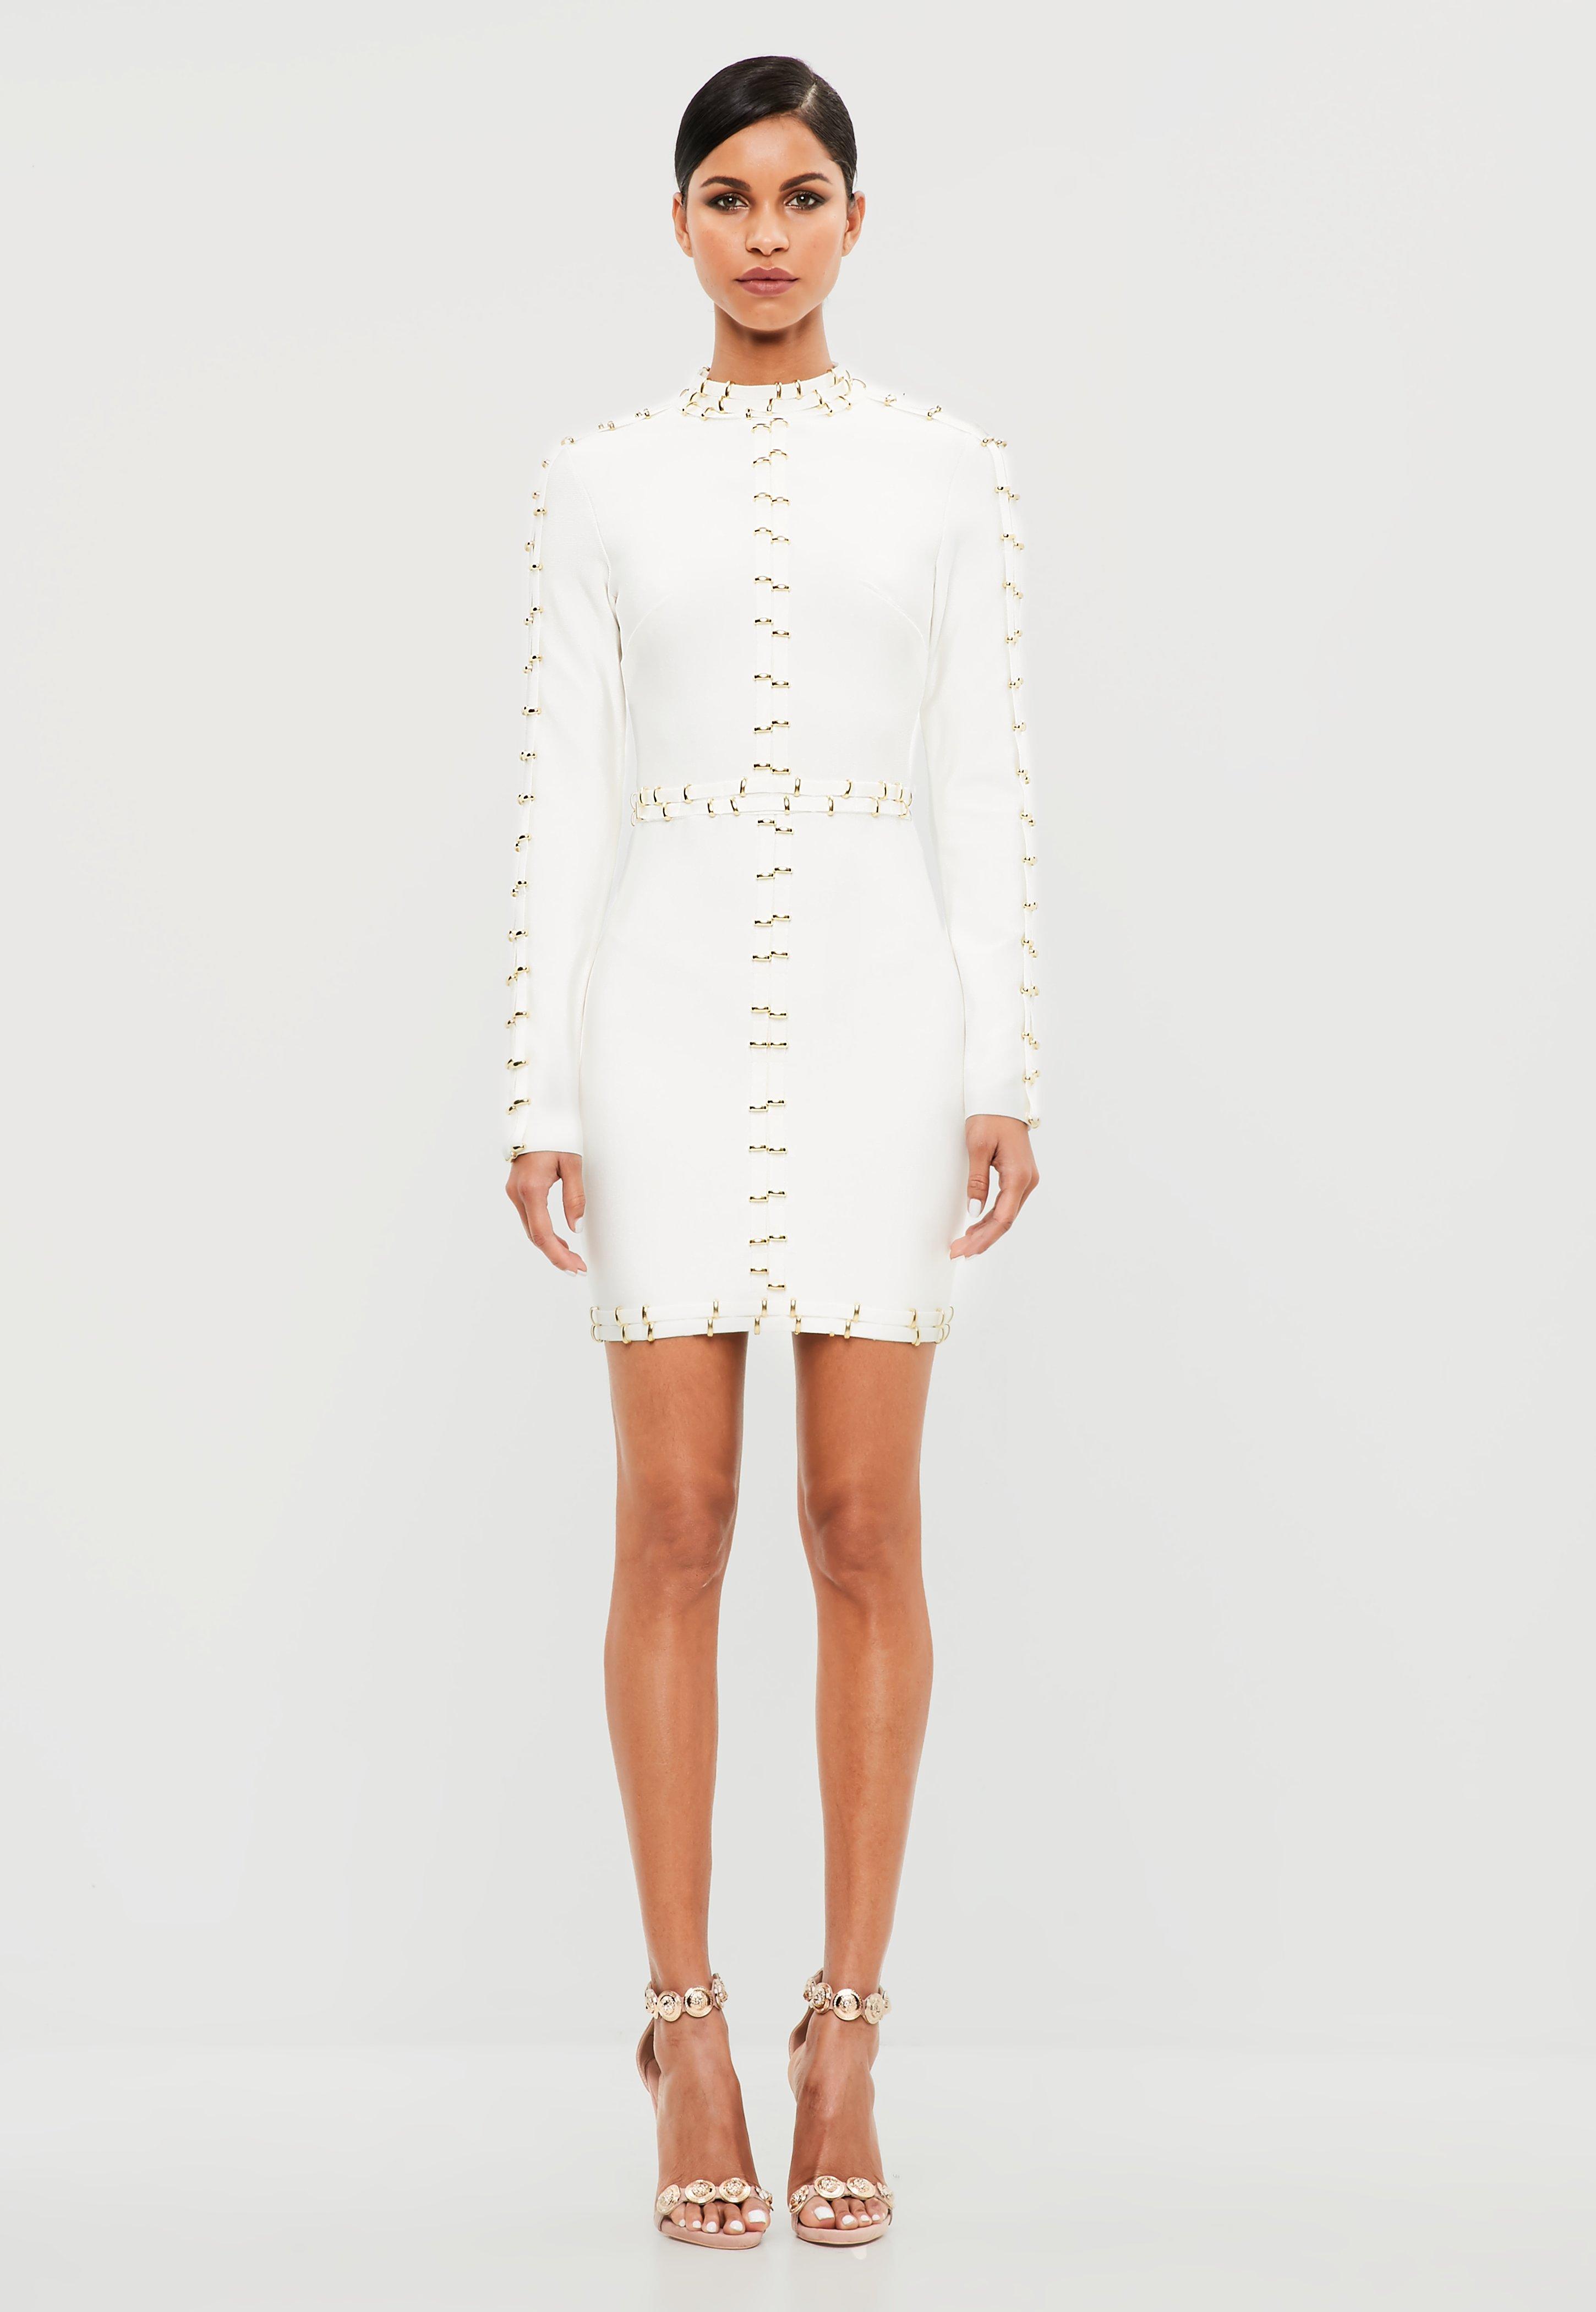 ff861c434a4e Peace + Love White High Neck Goldware Mini Dress